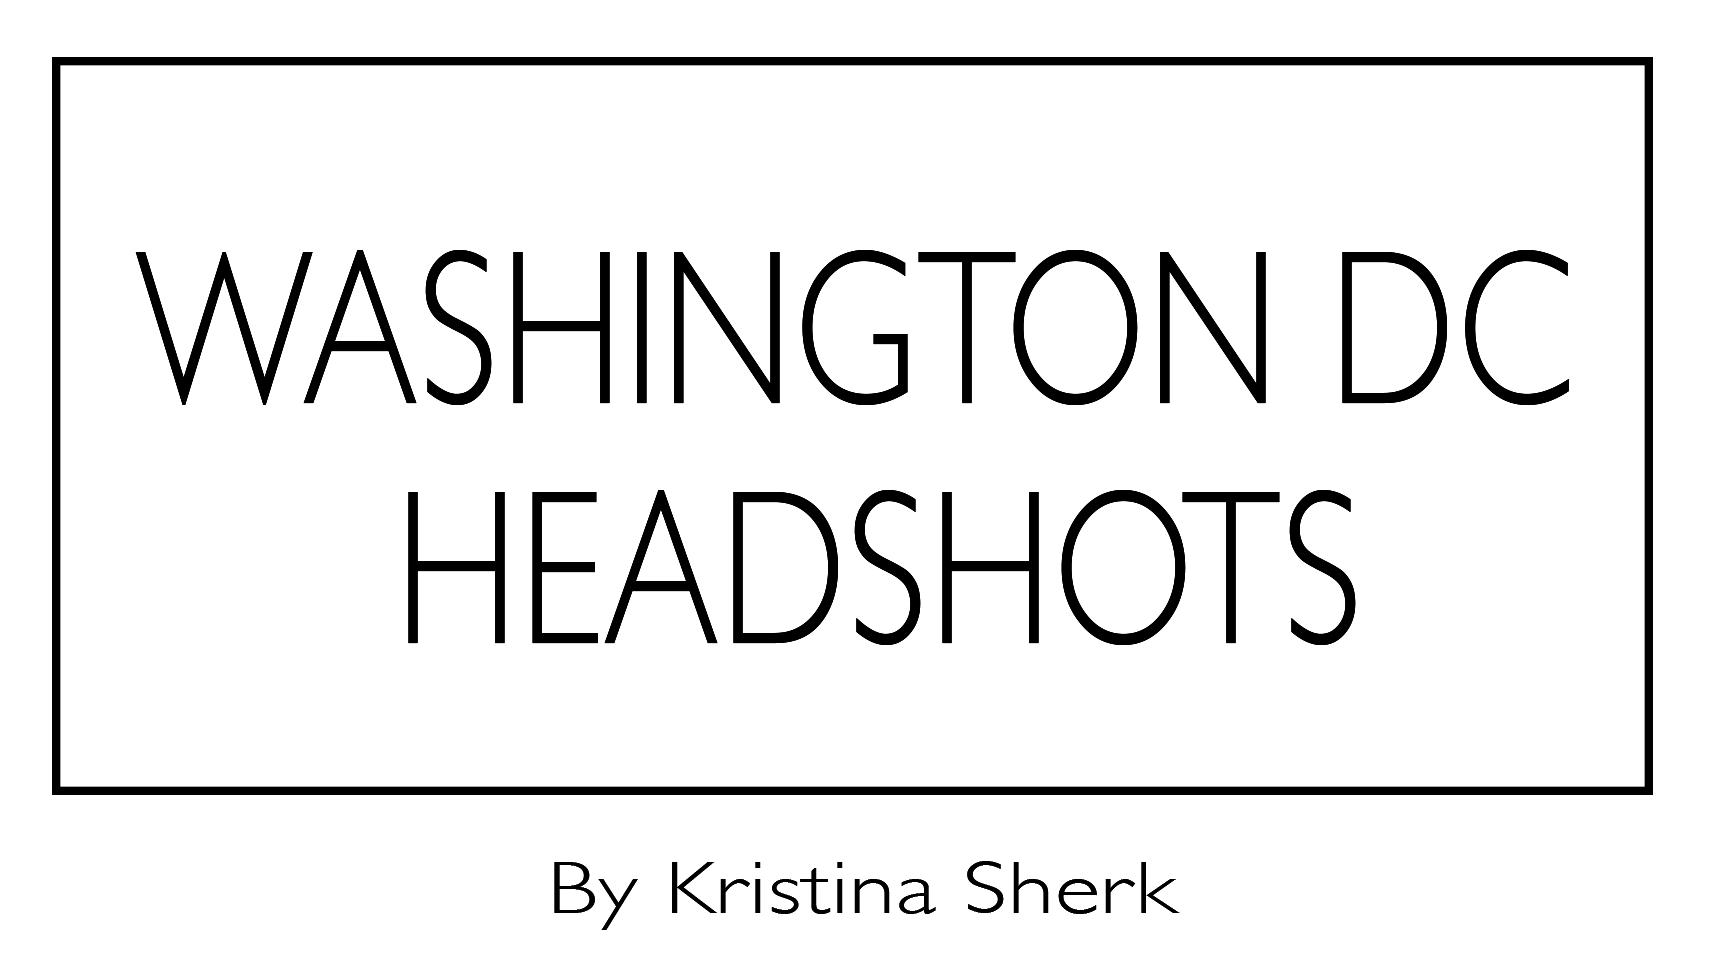 Washington DC Headshots